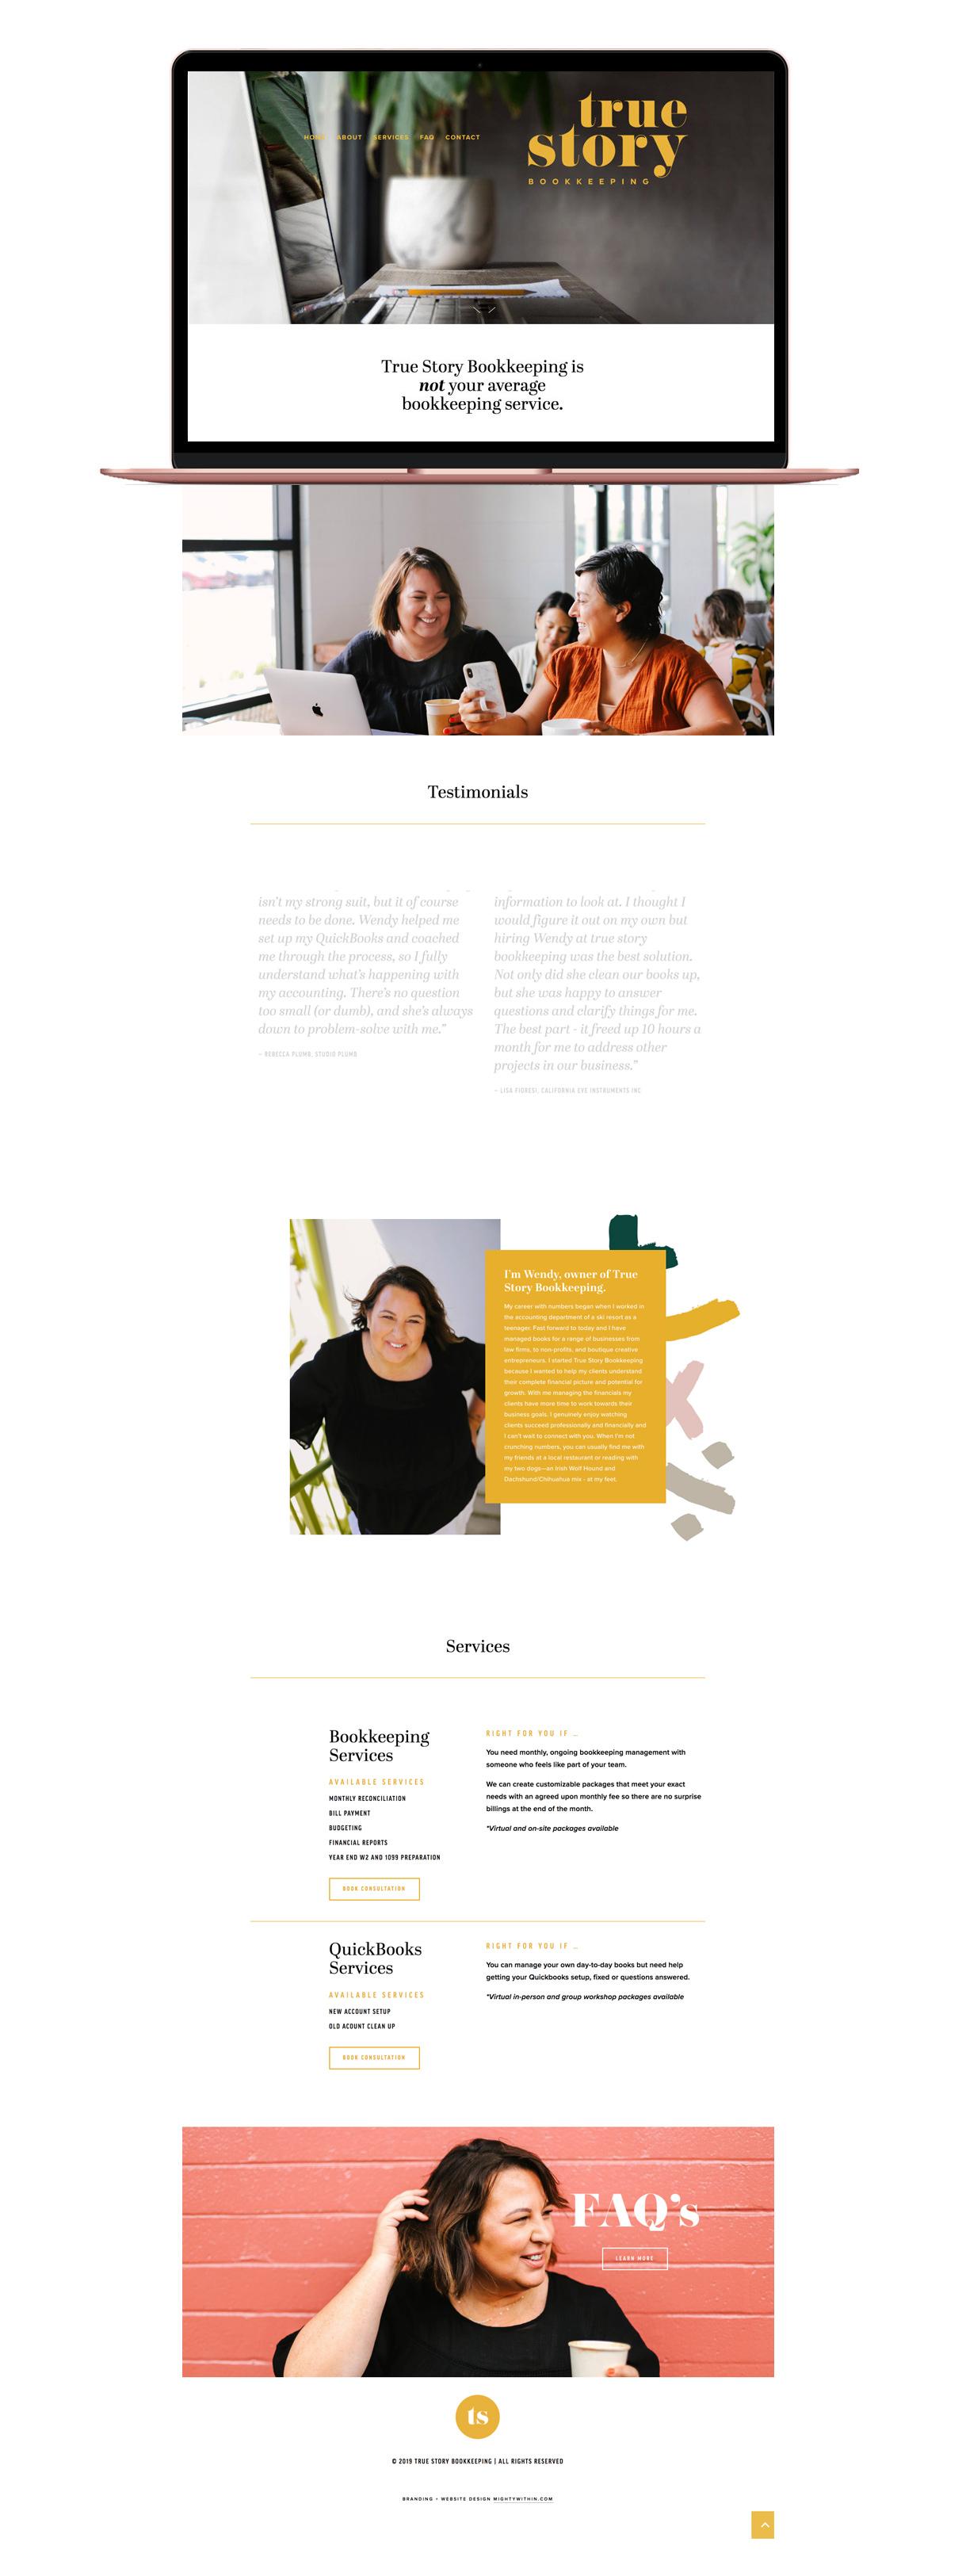 True Story Bookkeeping Squarespace Website Design